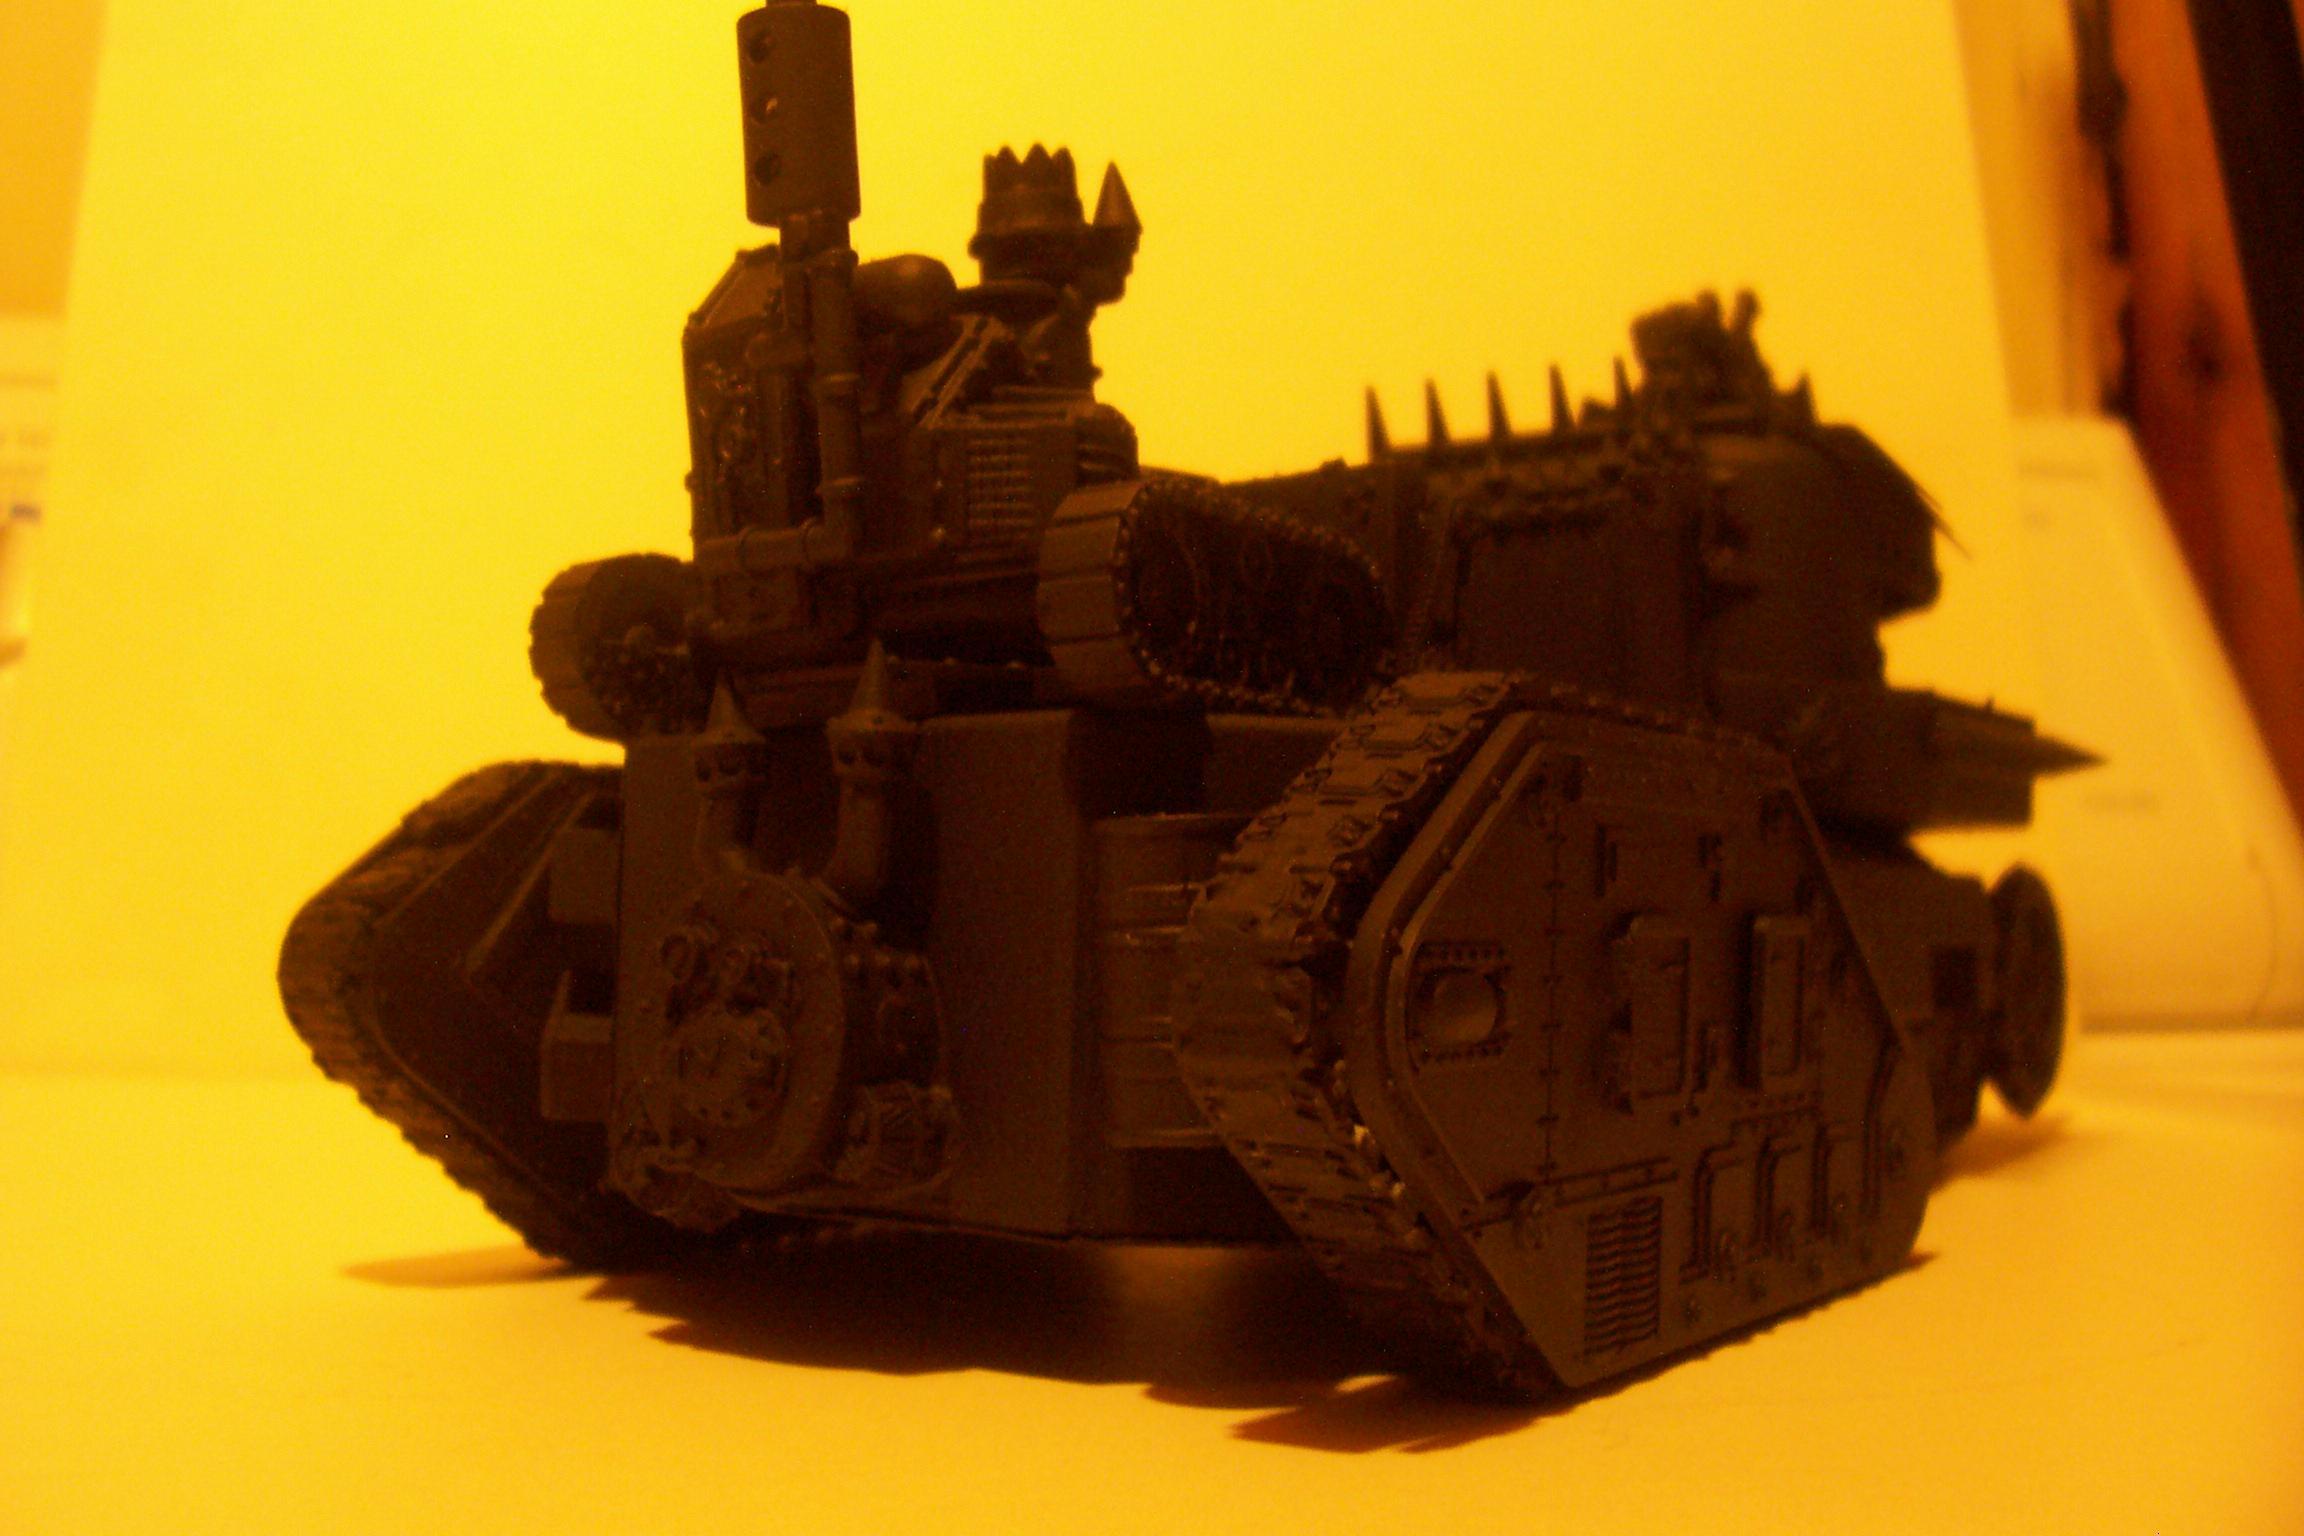 Battlewagon, Conversion, Leman Russ, Looted, Orks, Primered, Tank, Vehicle, Warhammer 40,000